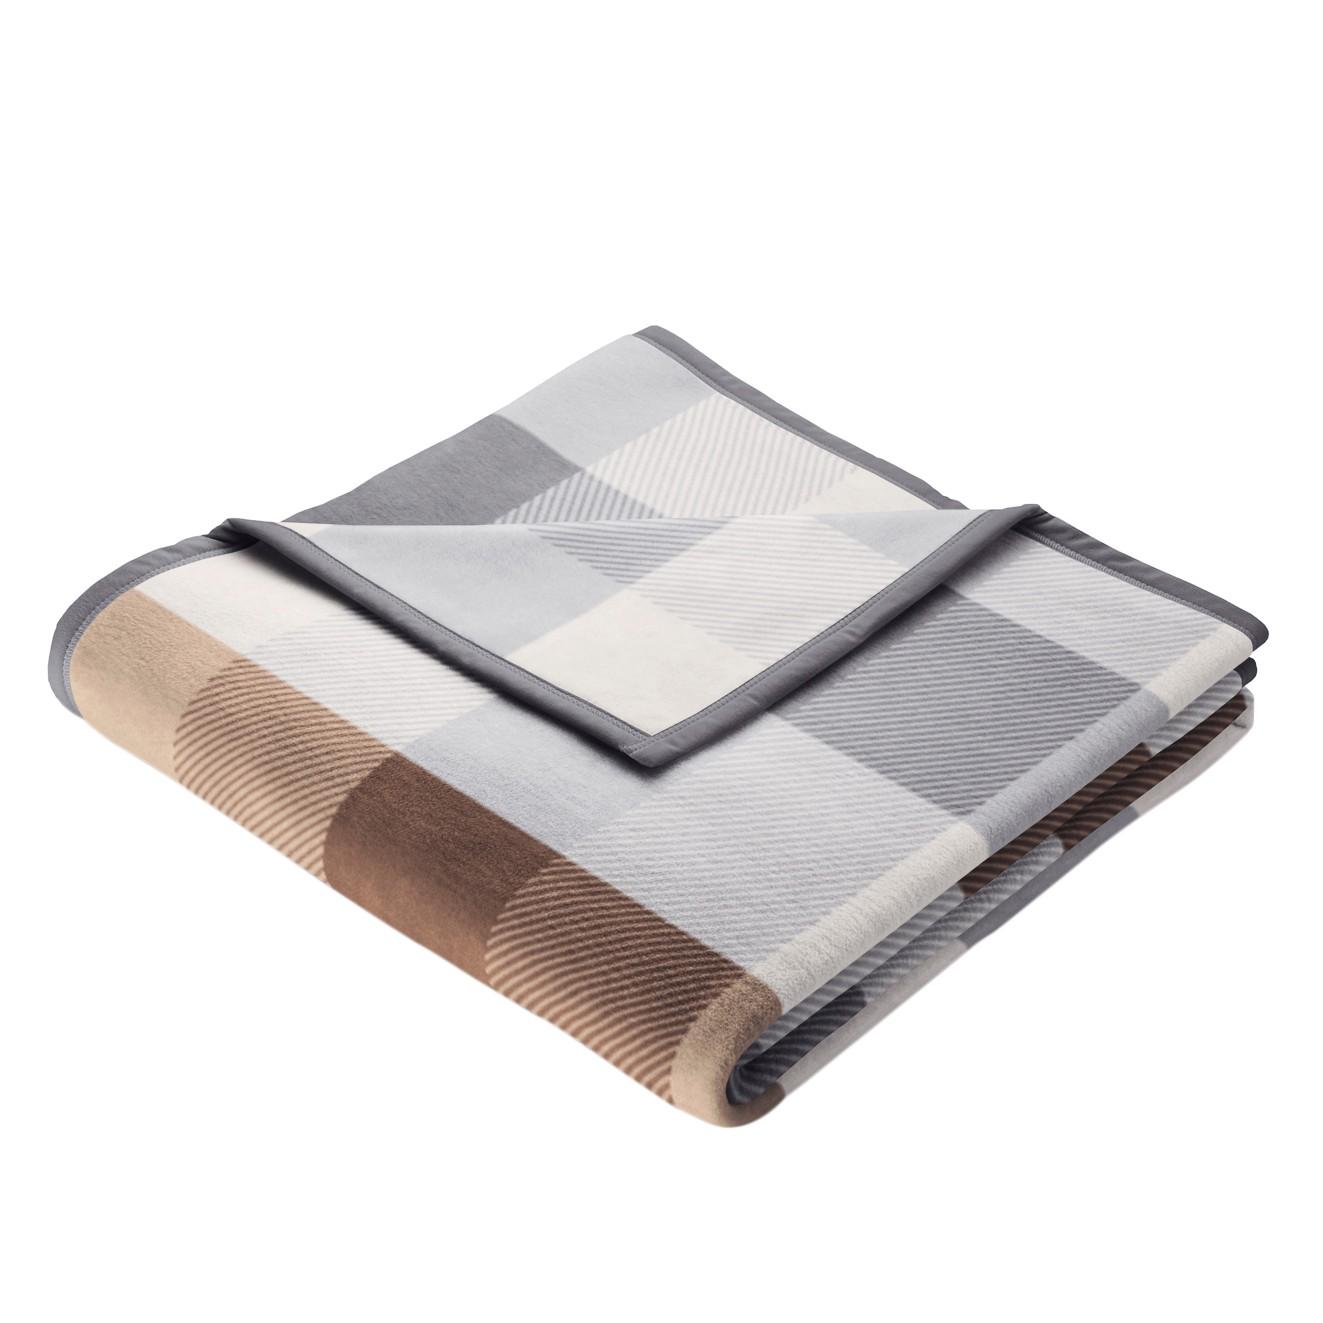 Plaid Art Abstracts - Webstoff Beige / Grau Sale Angebote Kröppen